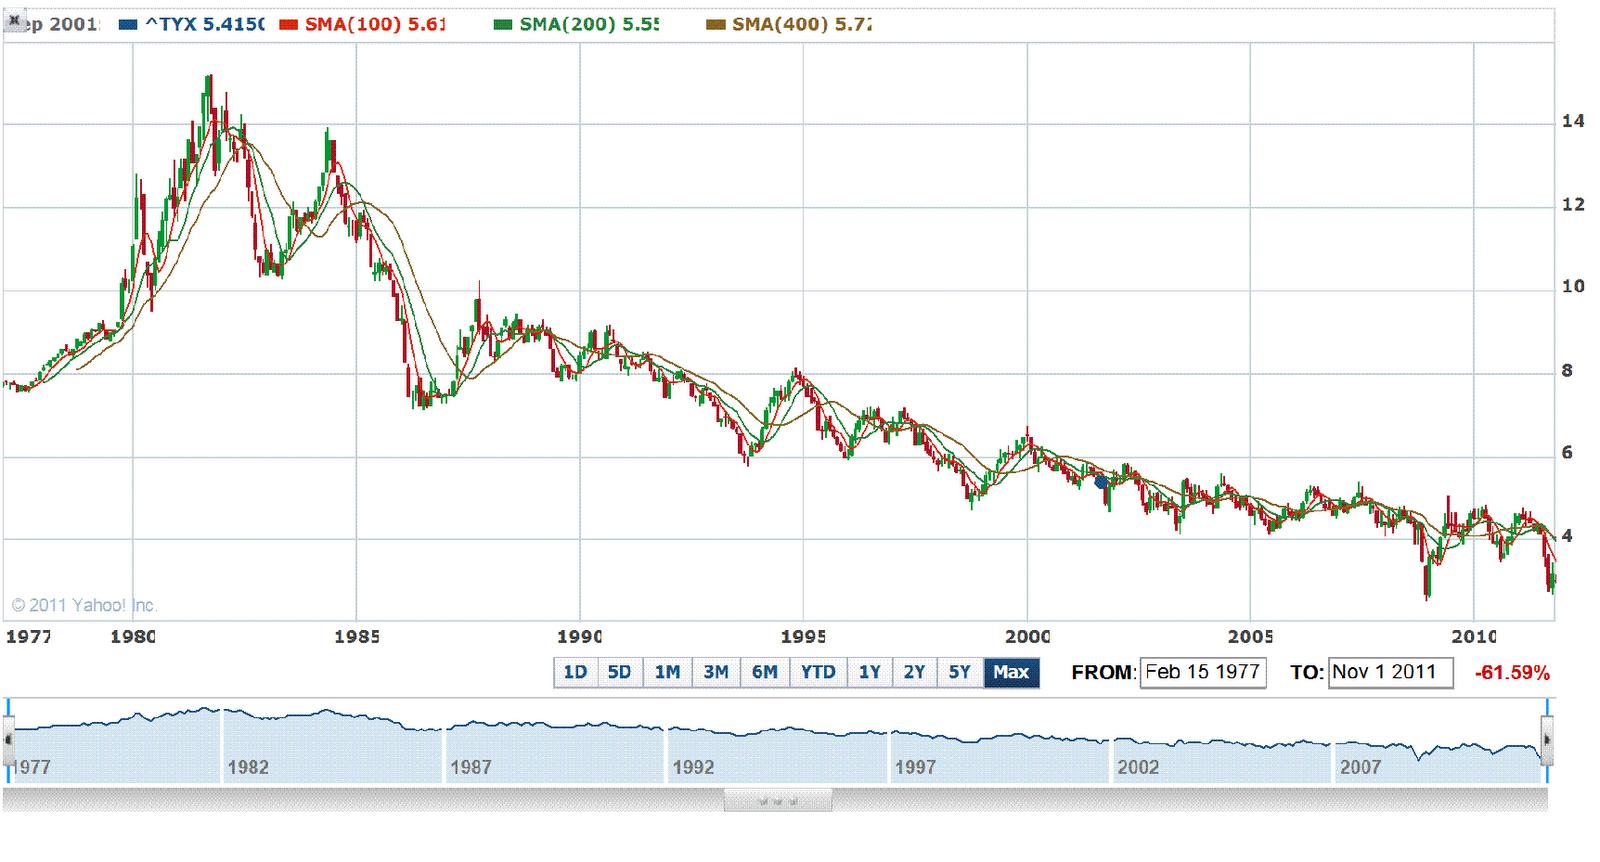 Nexttrade us 30 year treasury bond yield revisiting its 2008 low